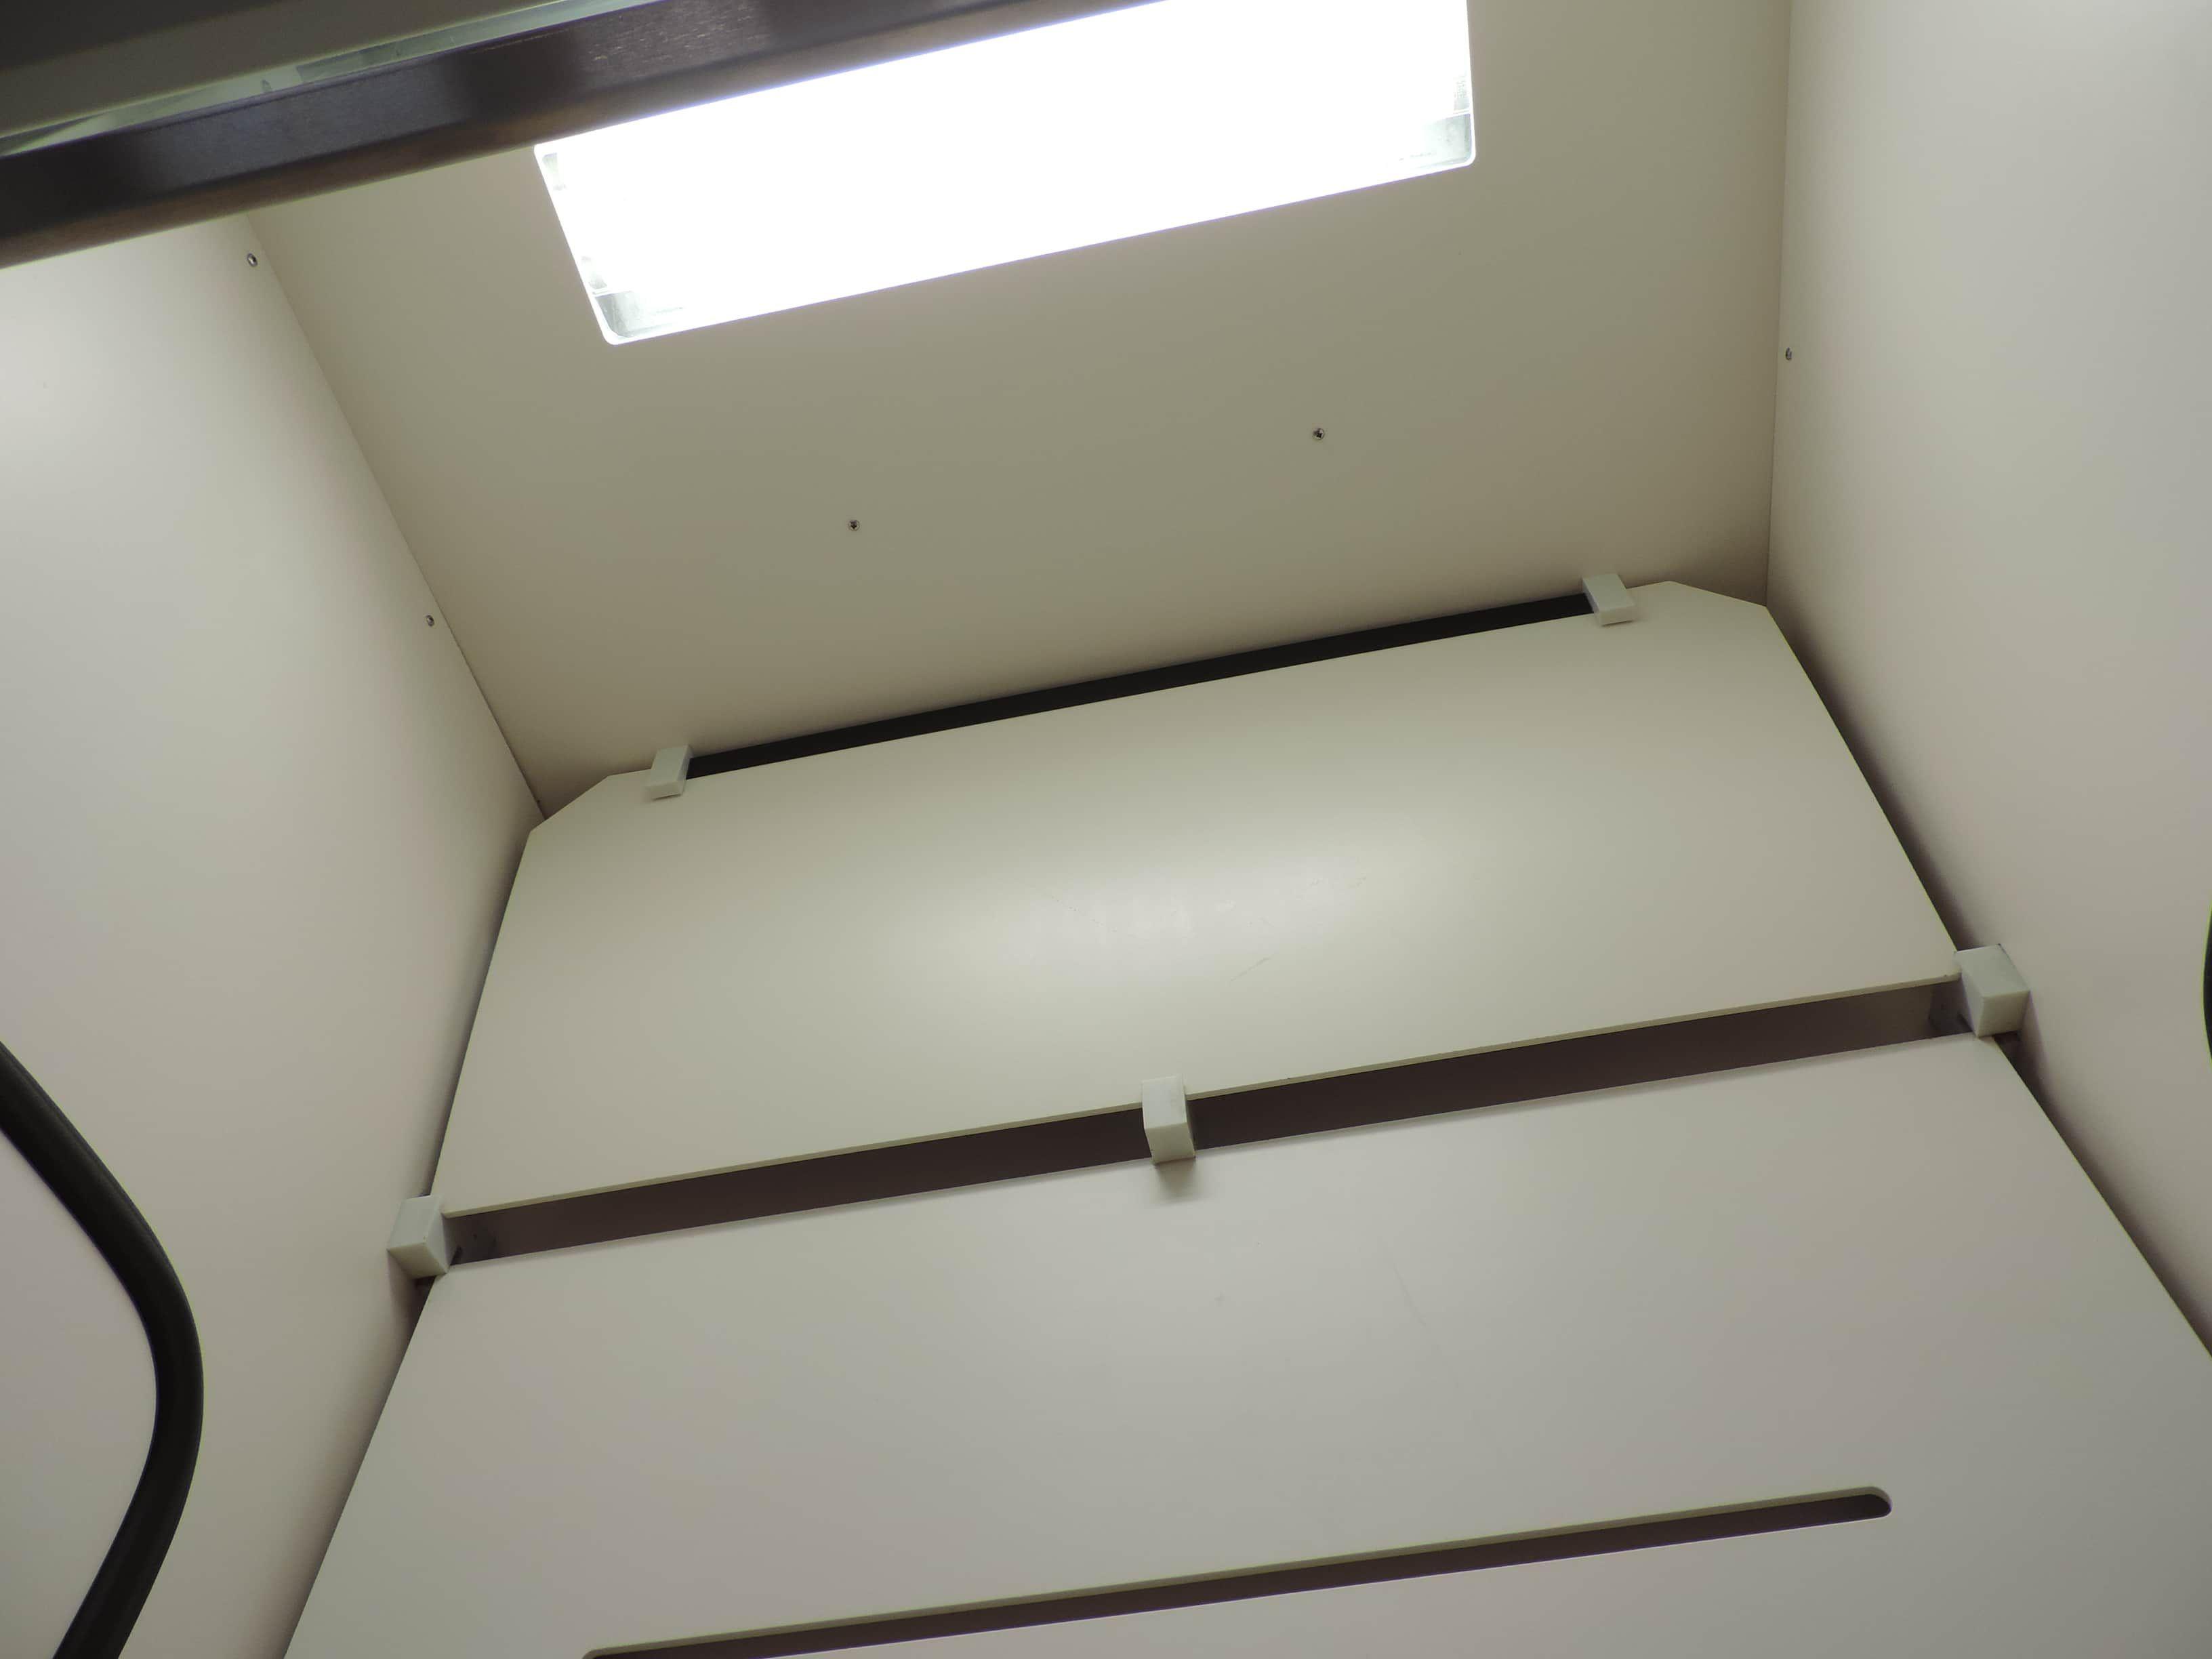 Hanson™ 3ft Laboratory Fume Hood (Bench Mount)